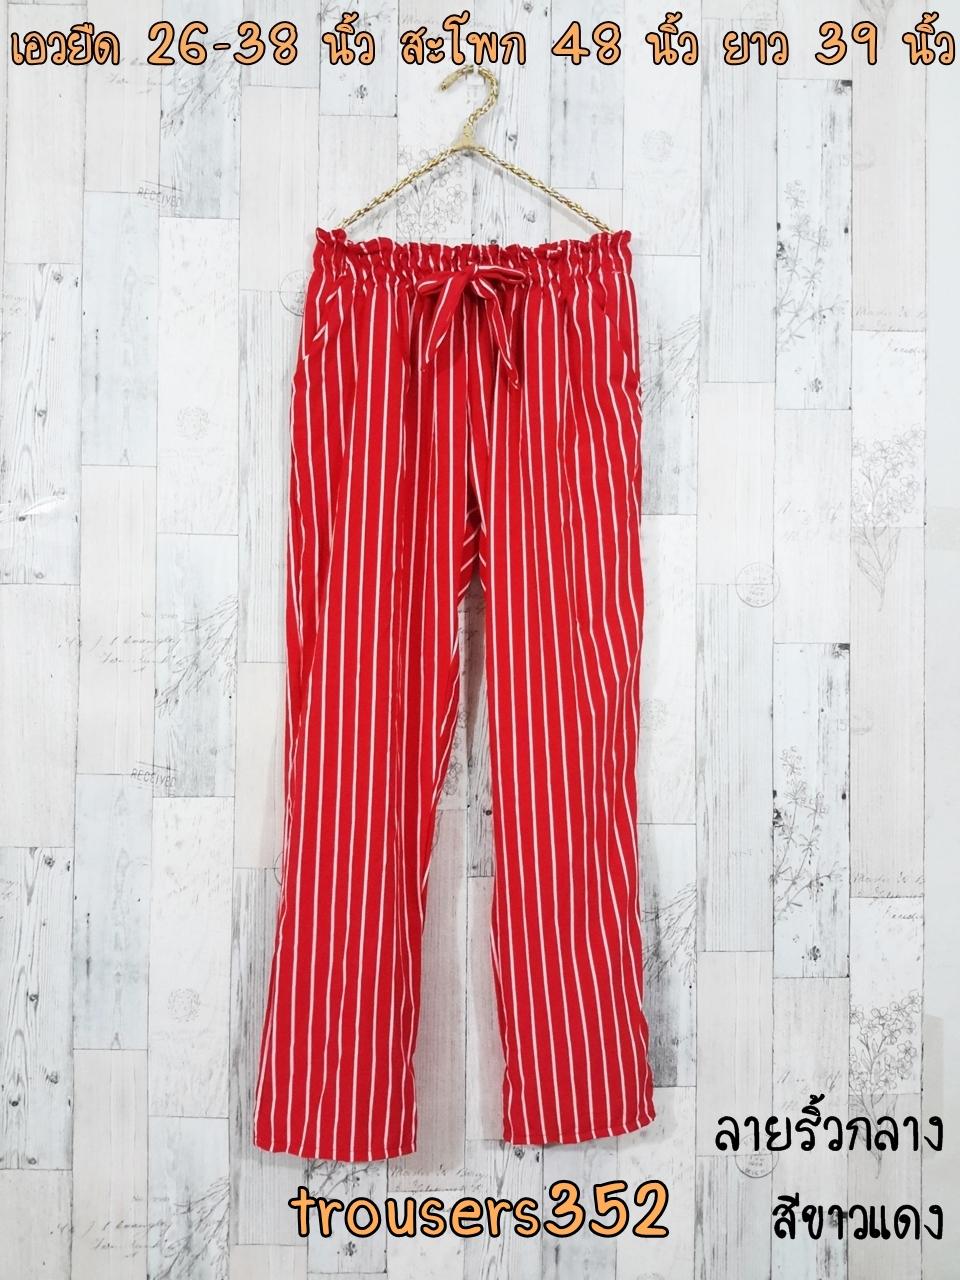 trousers352 กางเกงขายาวผ้าไหมอิตาลีเอวยืด 26-38 นิ้ว ลายริ้วกลางสีขาวแดง